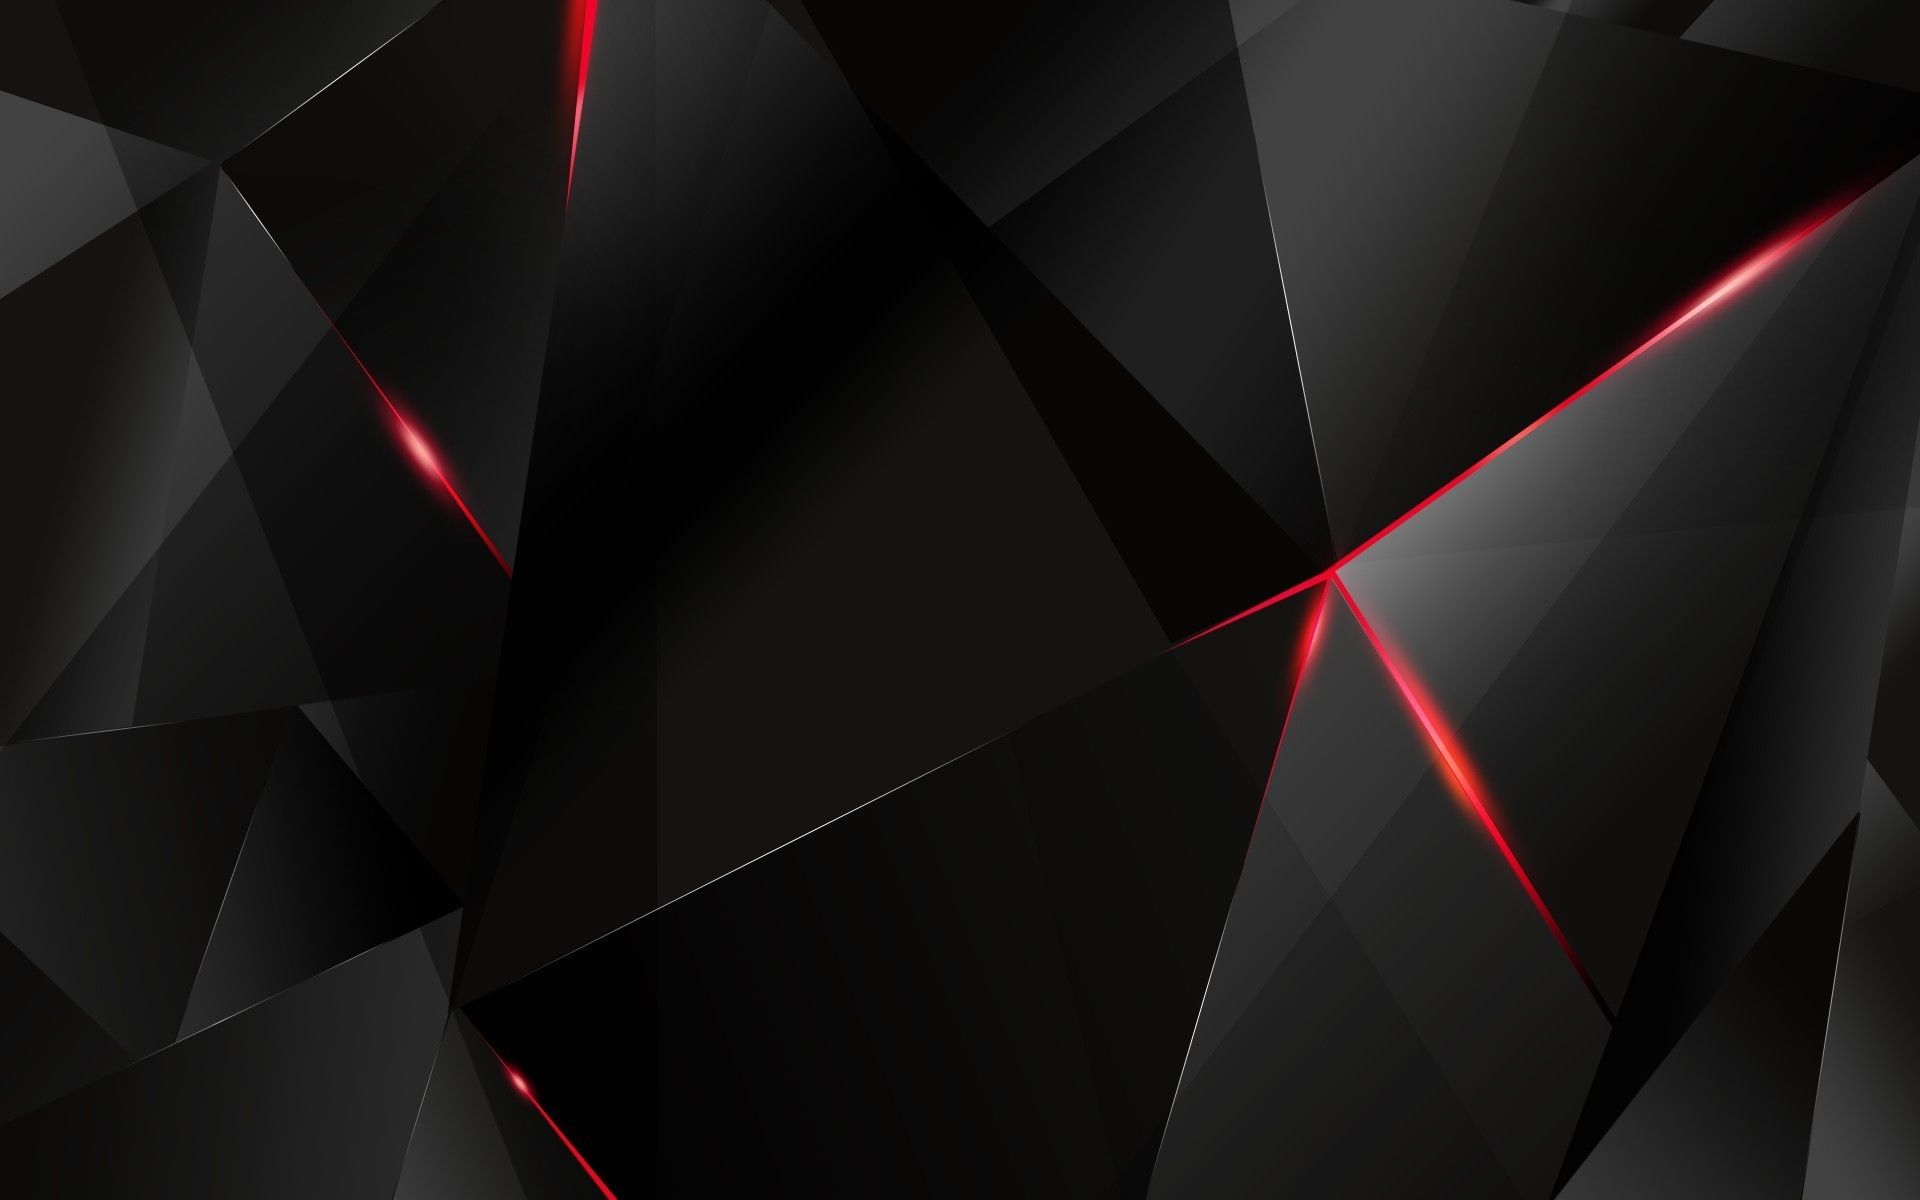 Dark red wallpaper hd wallpapersafari - Dark background wallpaper hd ...